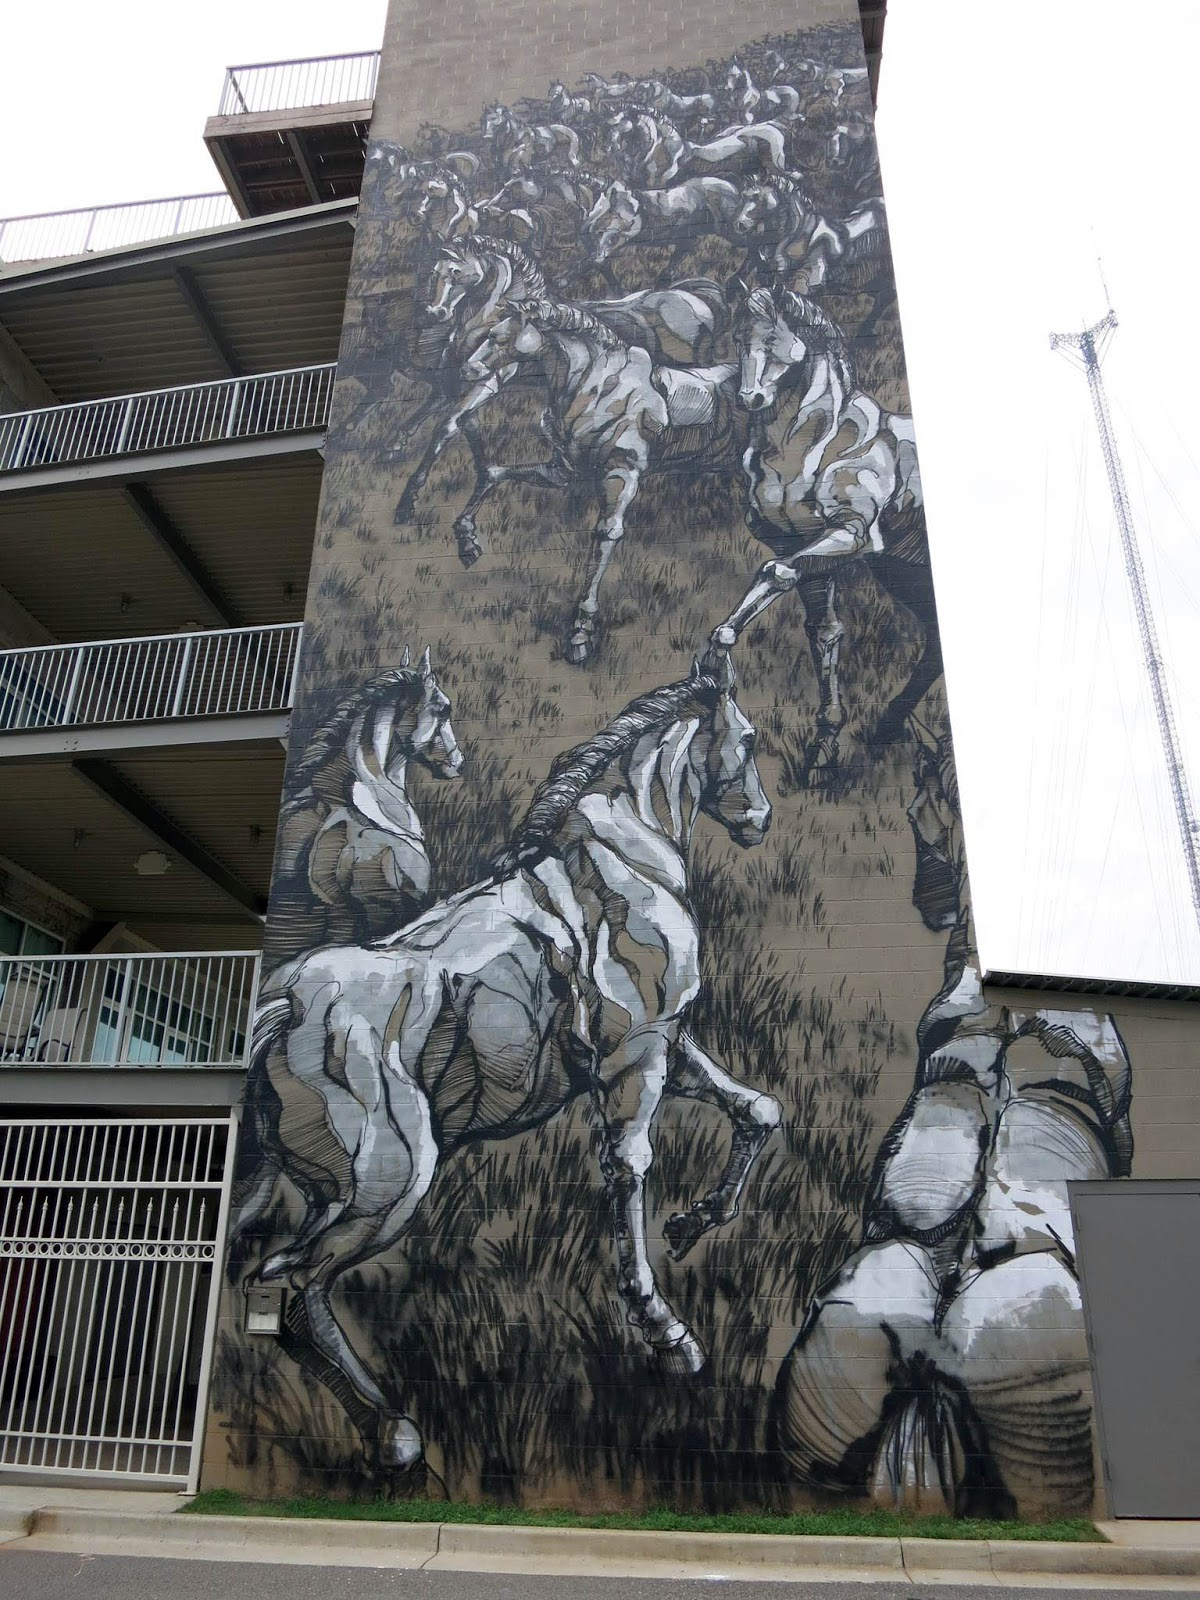 Jaz new mural in atlanta usa part ii streetartnews for Atlanta mural artist